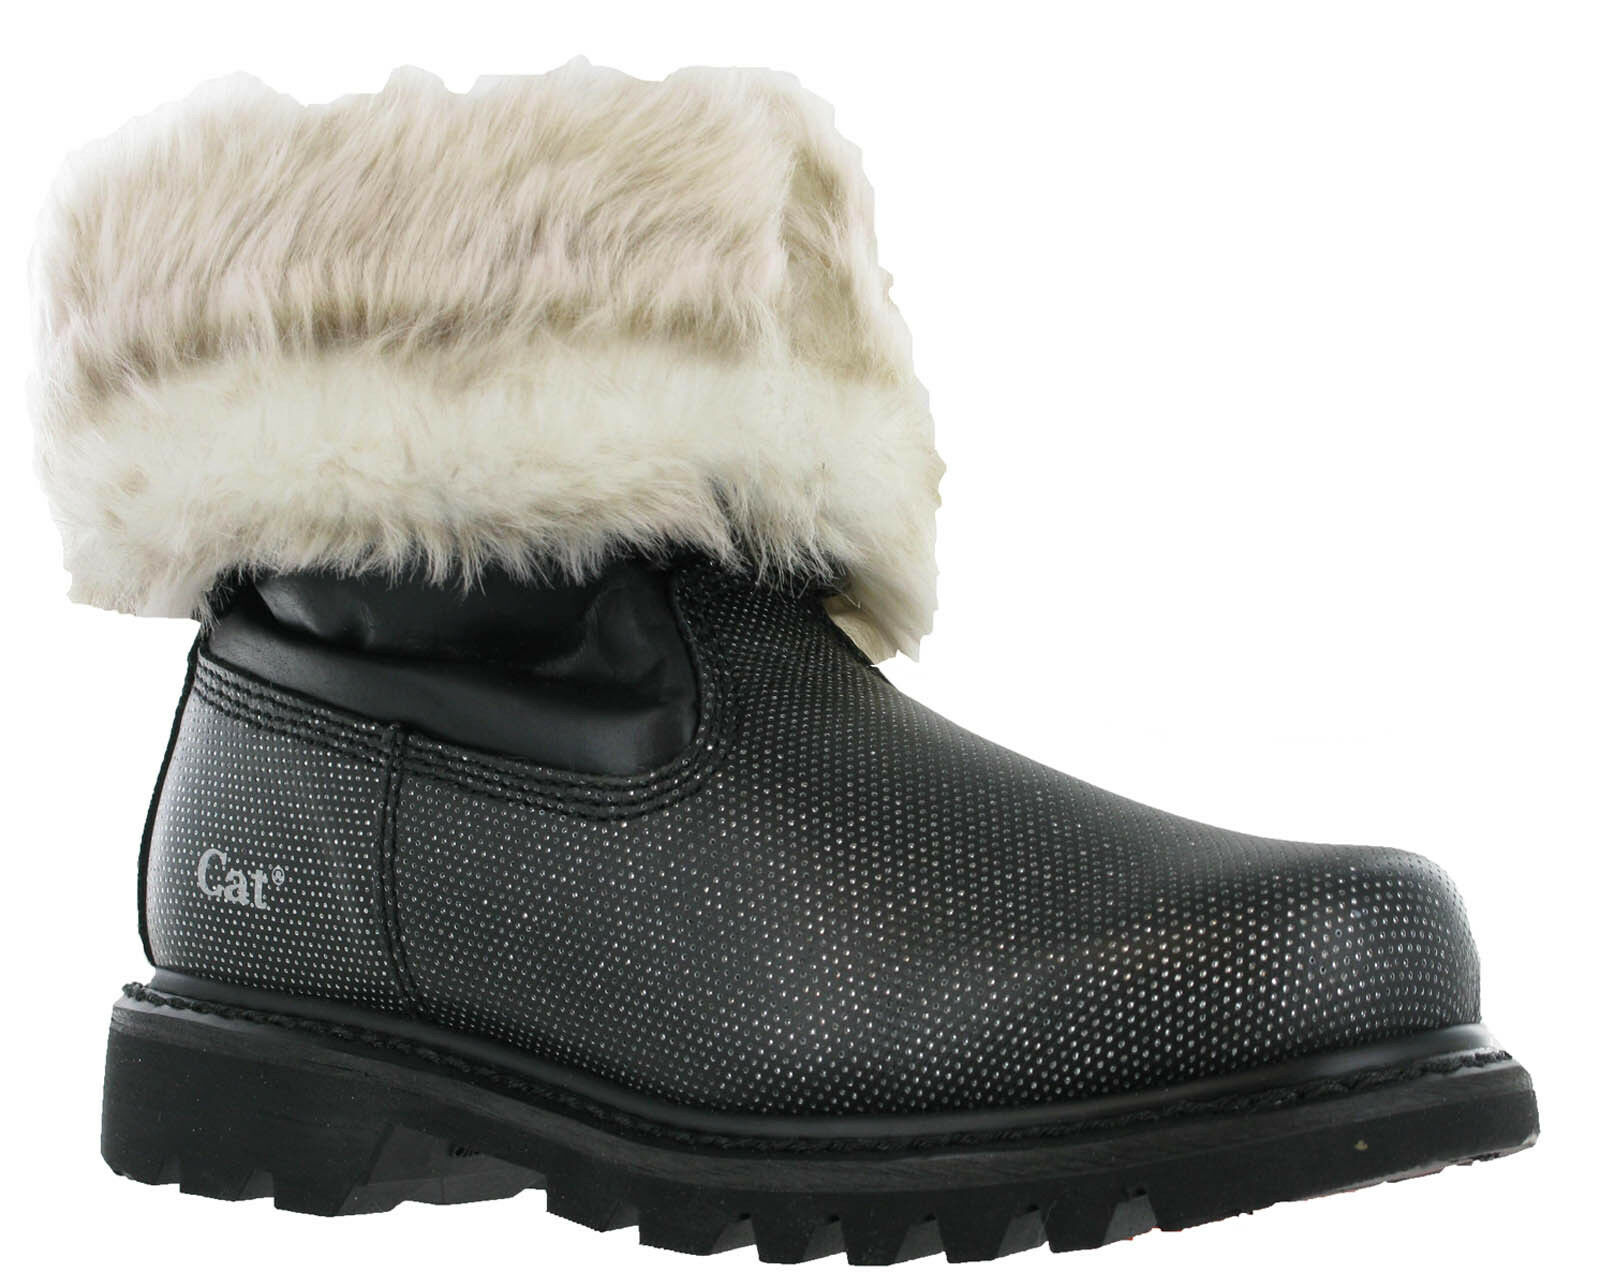 Caterpillar Bruiser Scrunch Fur Black Silver Slip On Womens Fashion Boots UK3-4